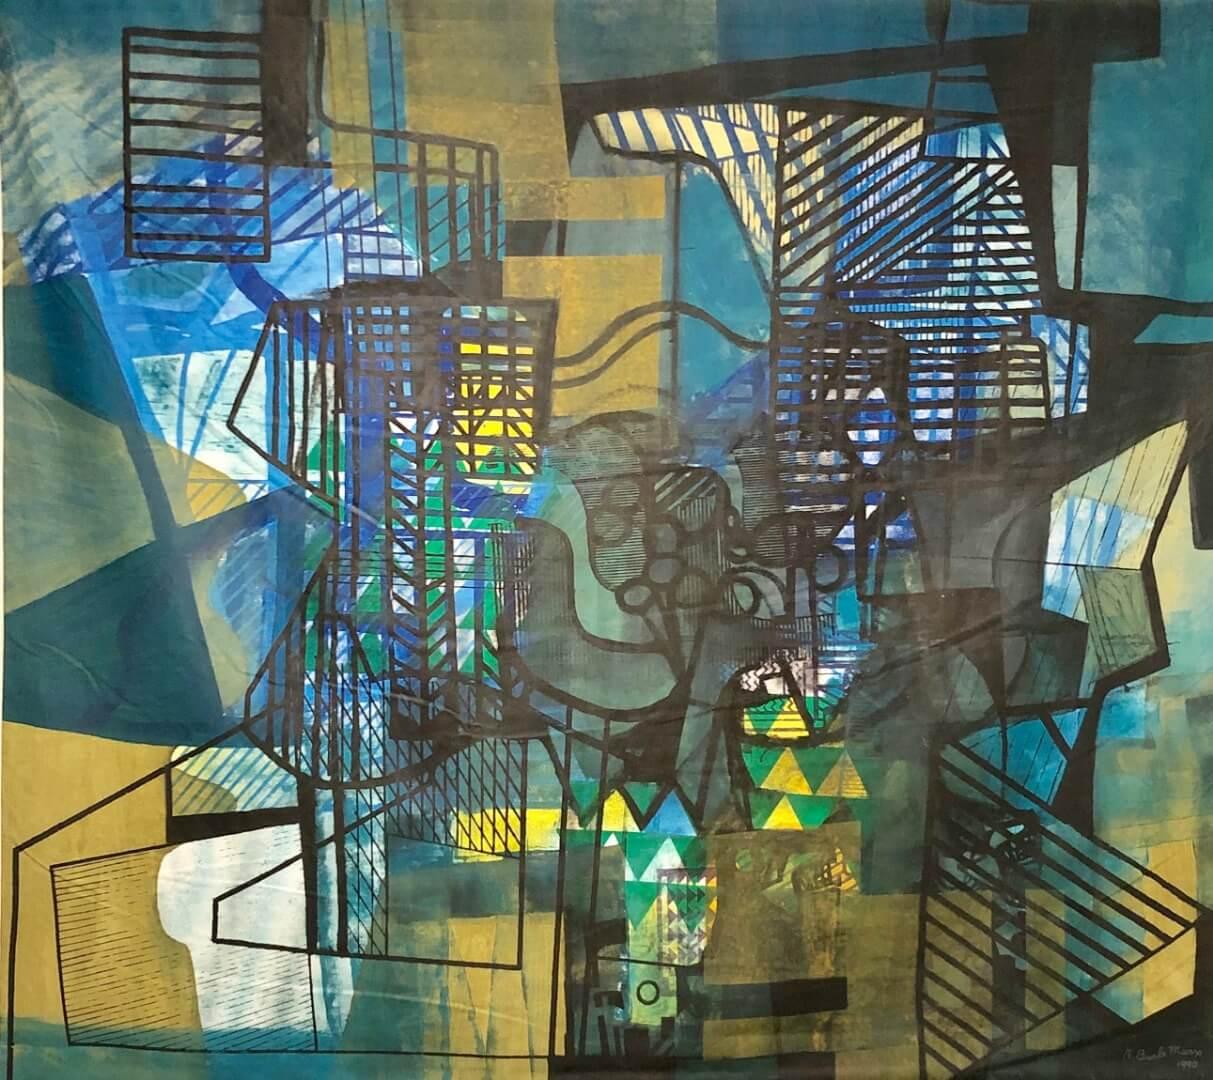 1_Roberto Burle Marx, Untitled, 1990, Acrylic on fabric